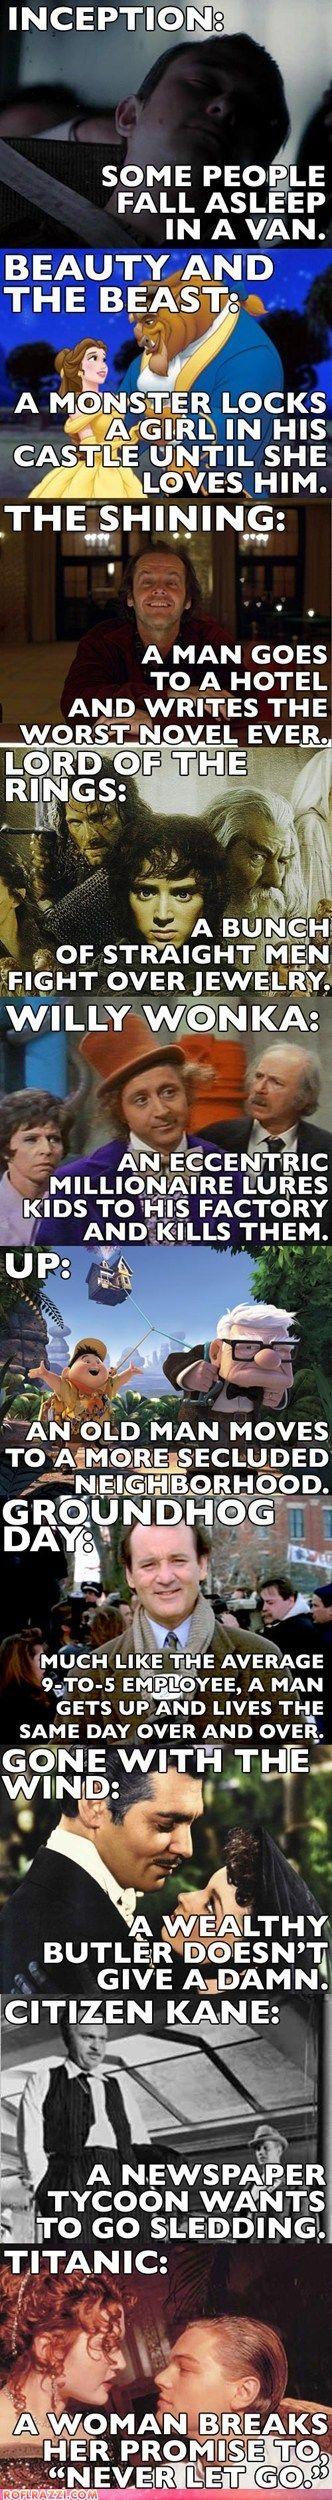 funny celebrity pictures - Slightly Skewed Movie Descriptions